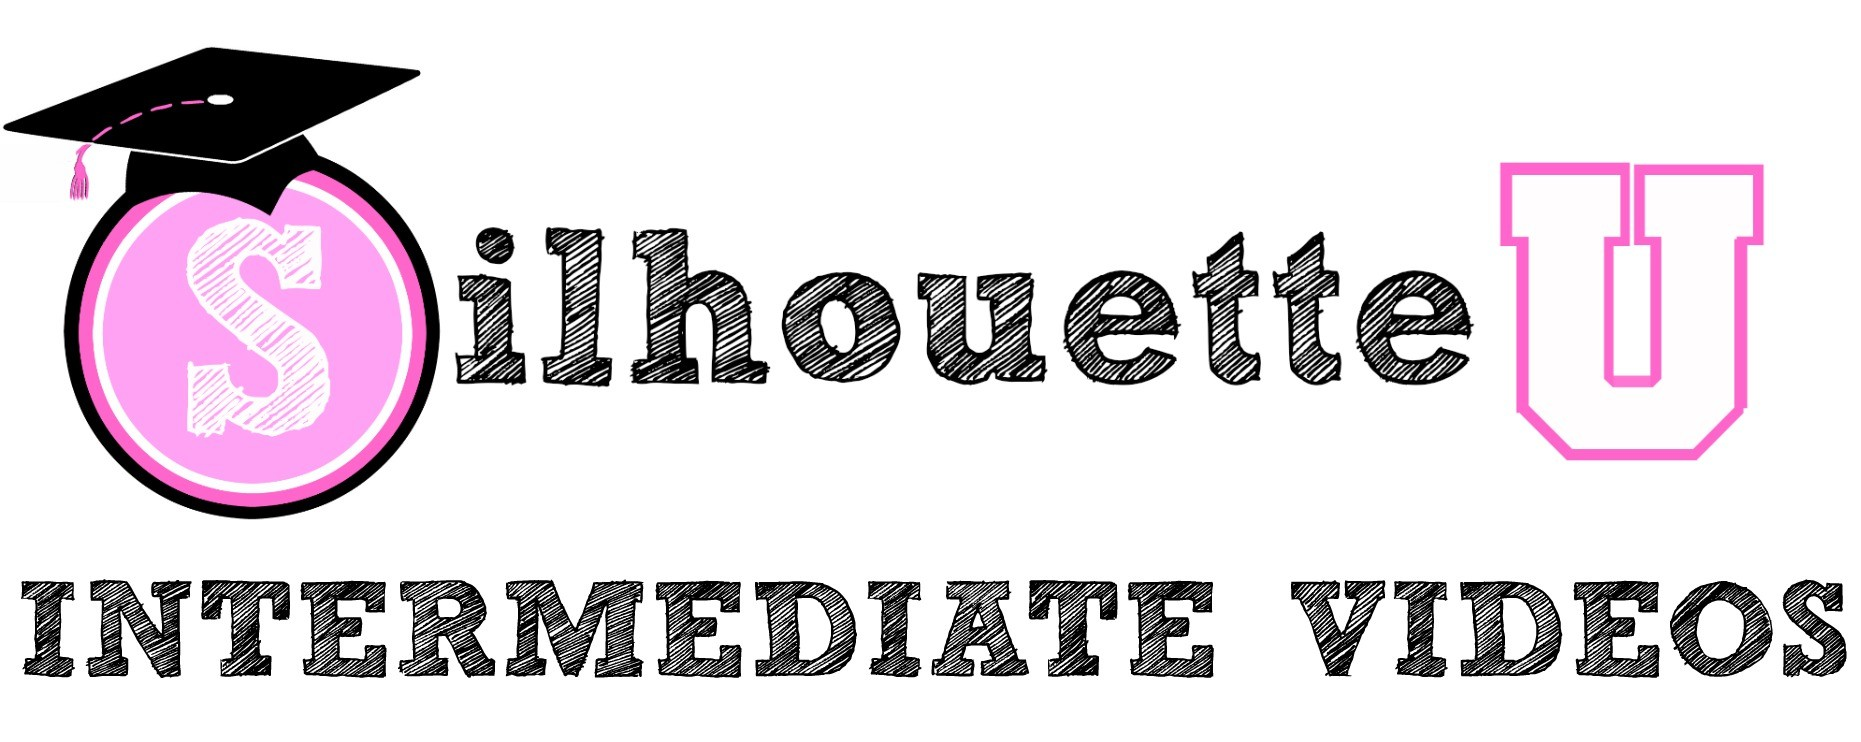 SU Intermediate Videos Banner Image.jpg